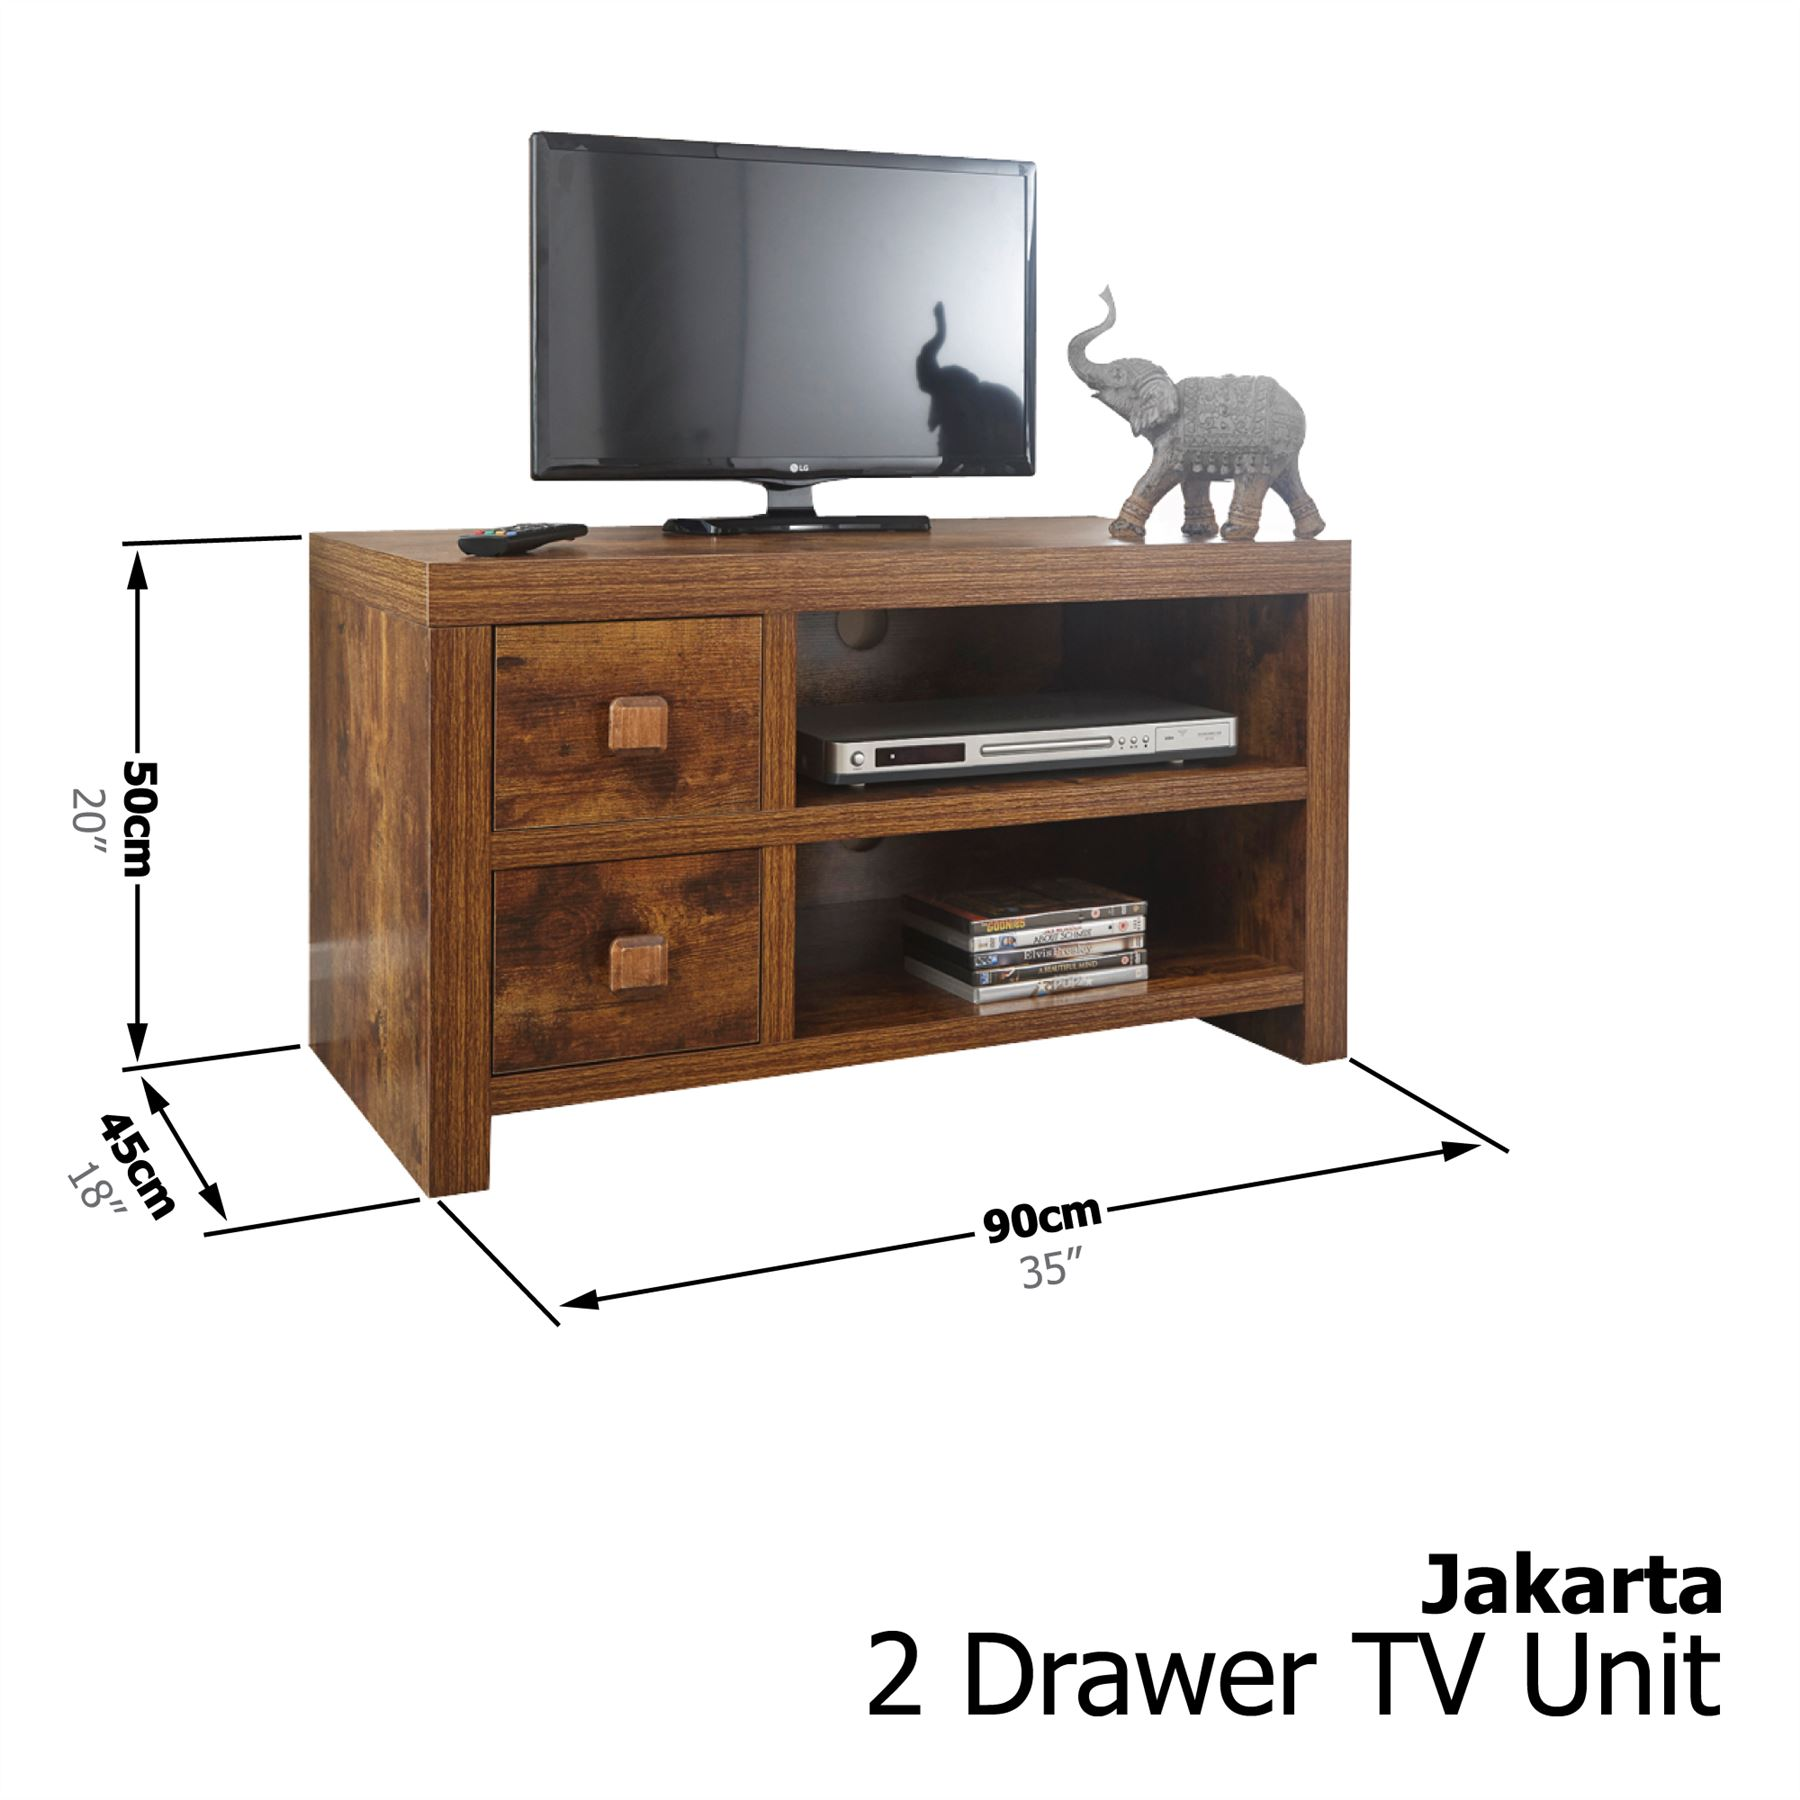 jakarta mango living room nest table slim drawers tv unit cube  - jakartamangolivingroomnesttableslimdrawers